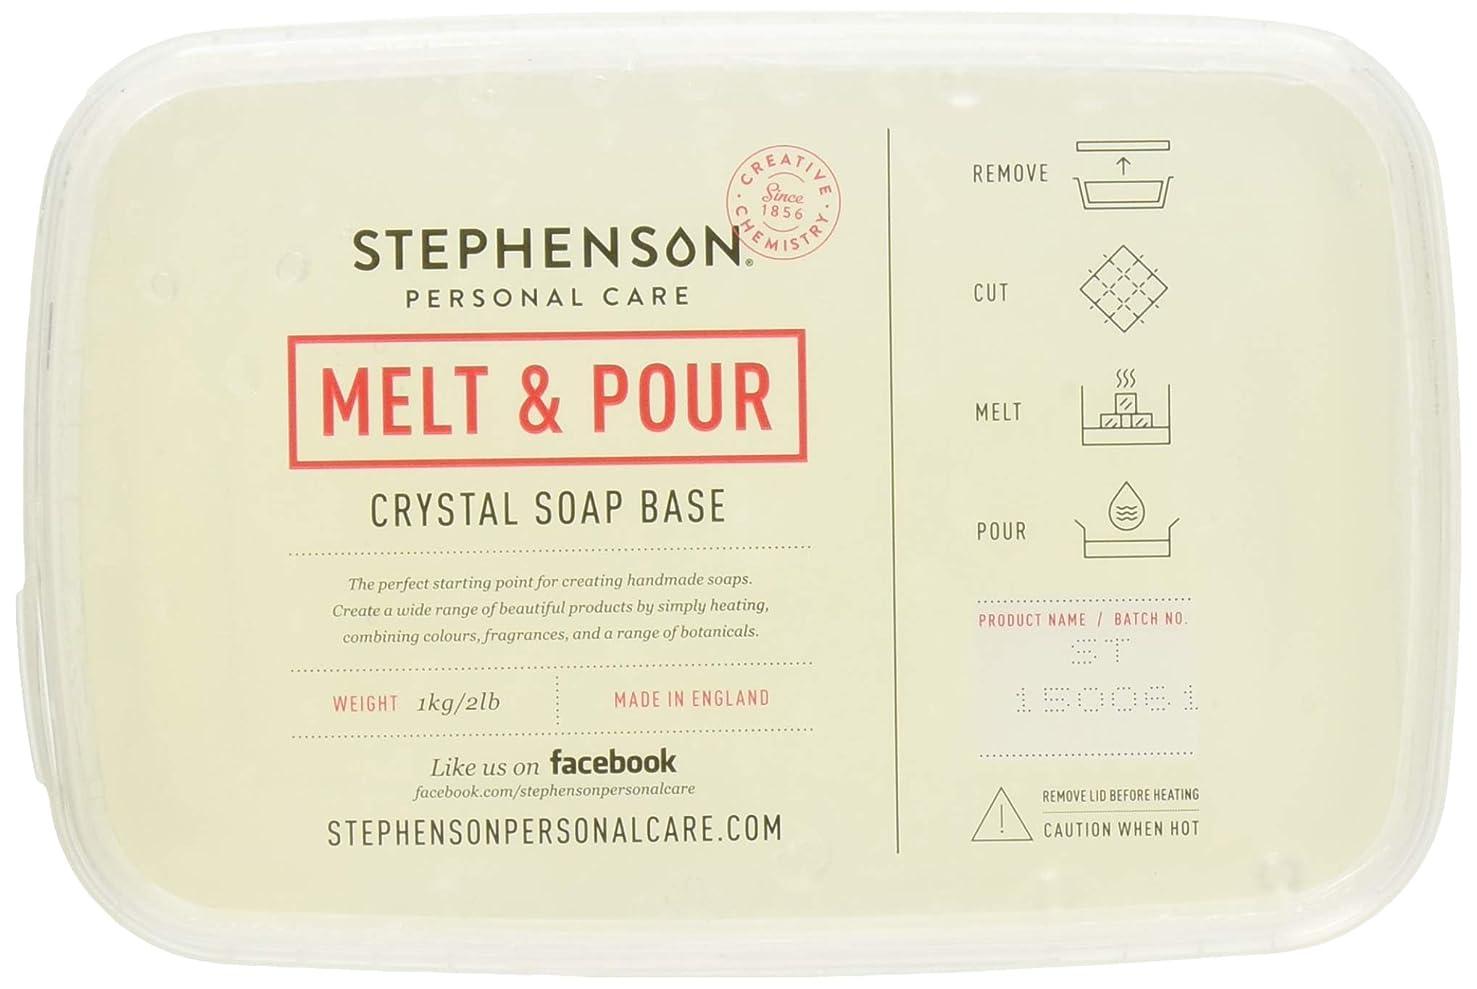 Stephenson Step Clear Melt and Pour Soap Base 2lb